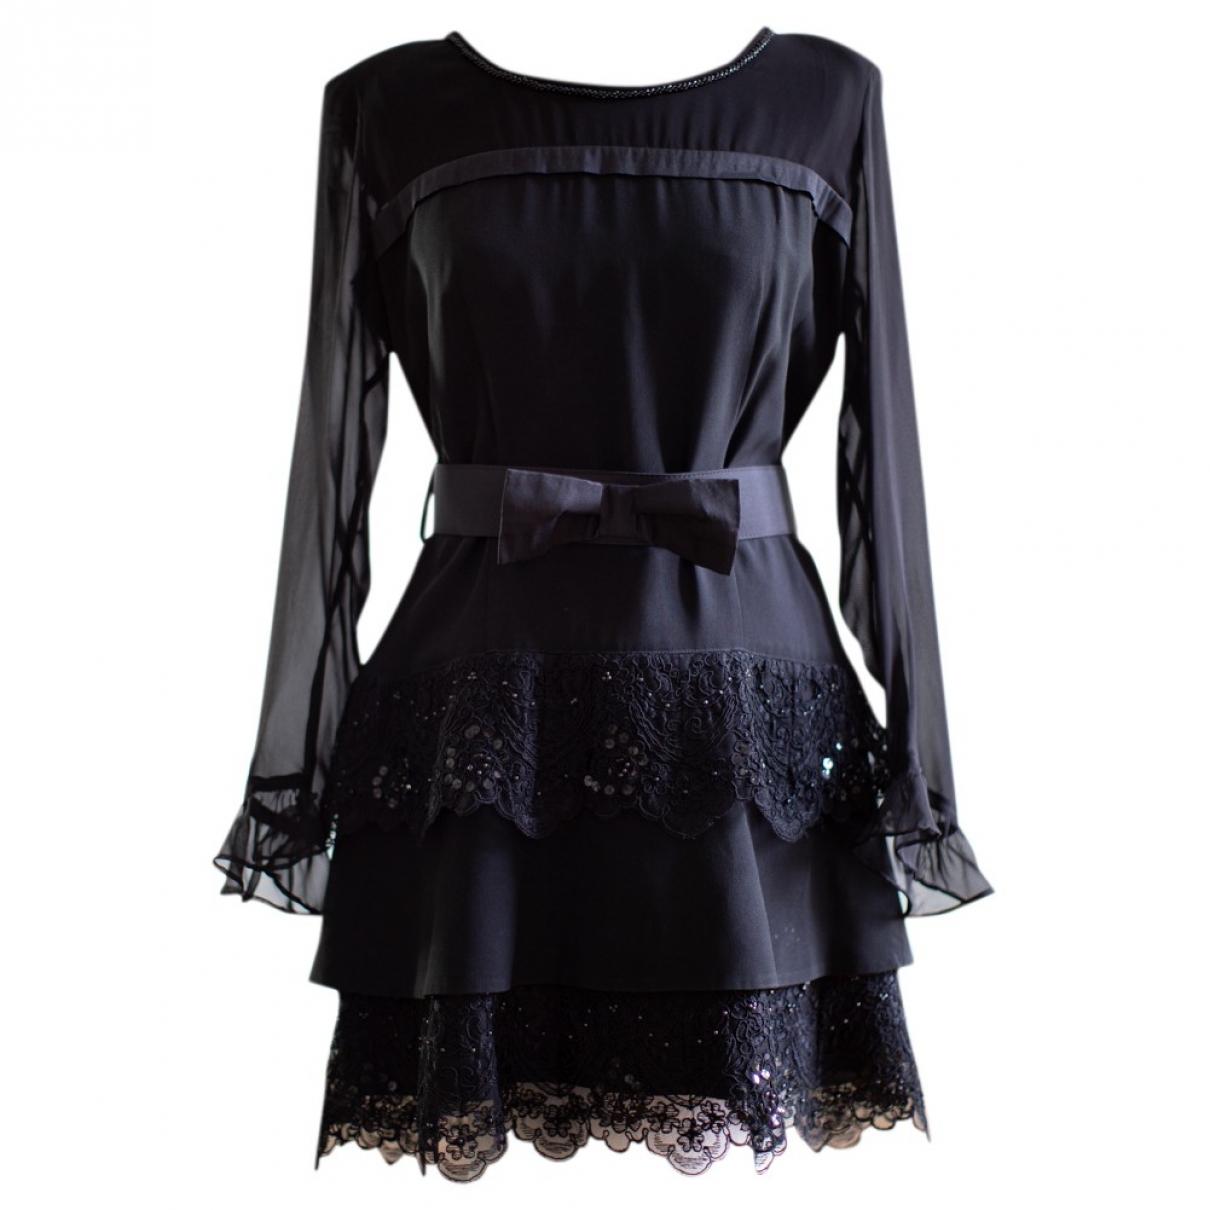 Maria Grazia Severi \N Black dress for Women 44 IT